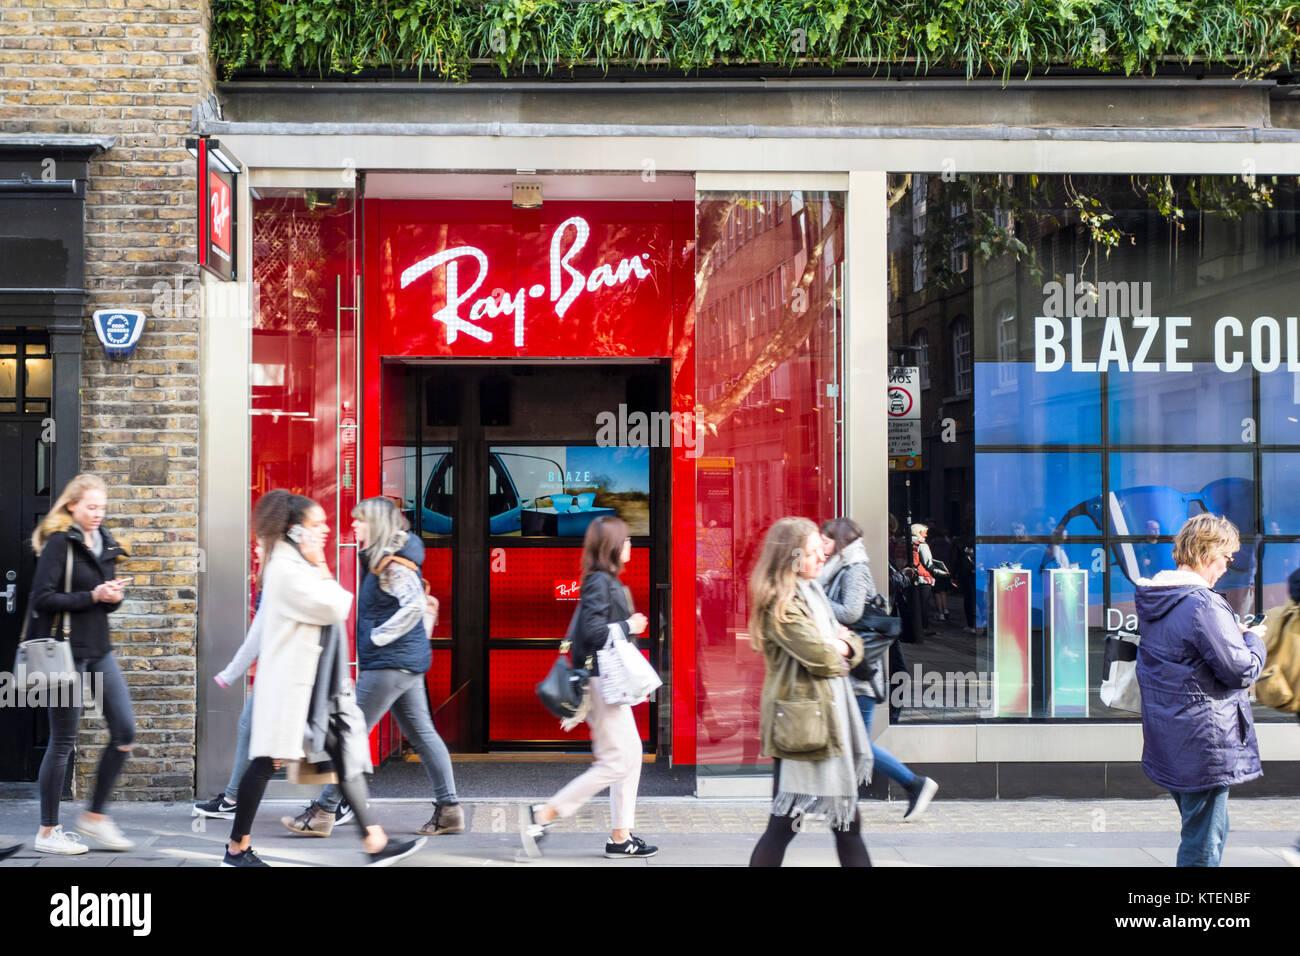 ray ban com store